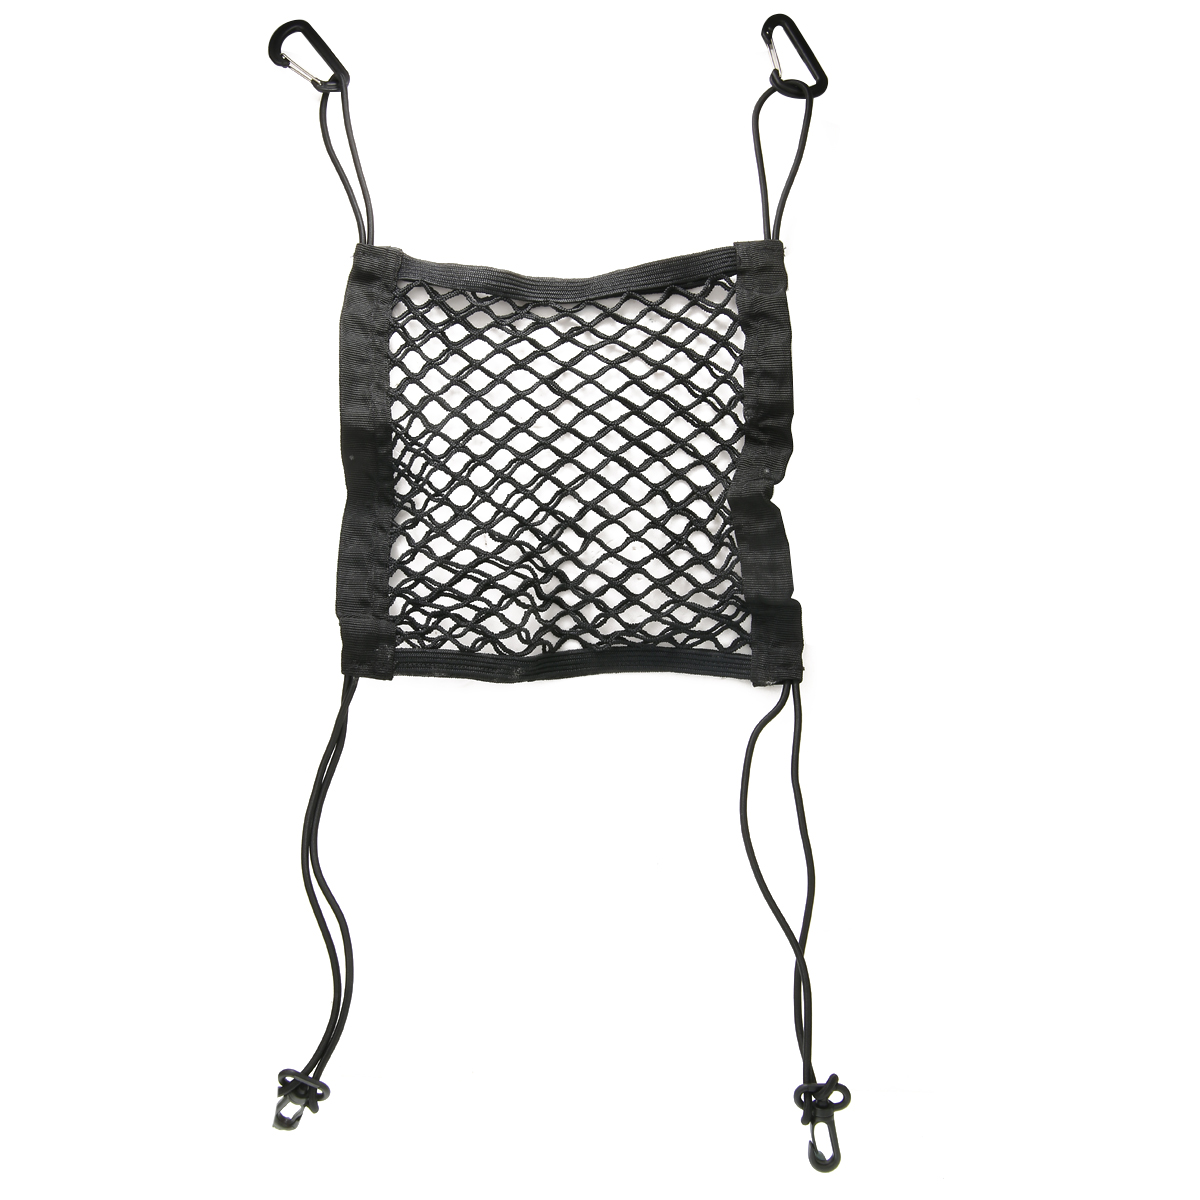 26cm*24cm Car Organizer Seat Back Storage Elastic Car Mesh Net Bag Between Bags Luggage Holder Pocket Car Styling